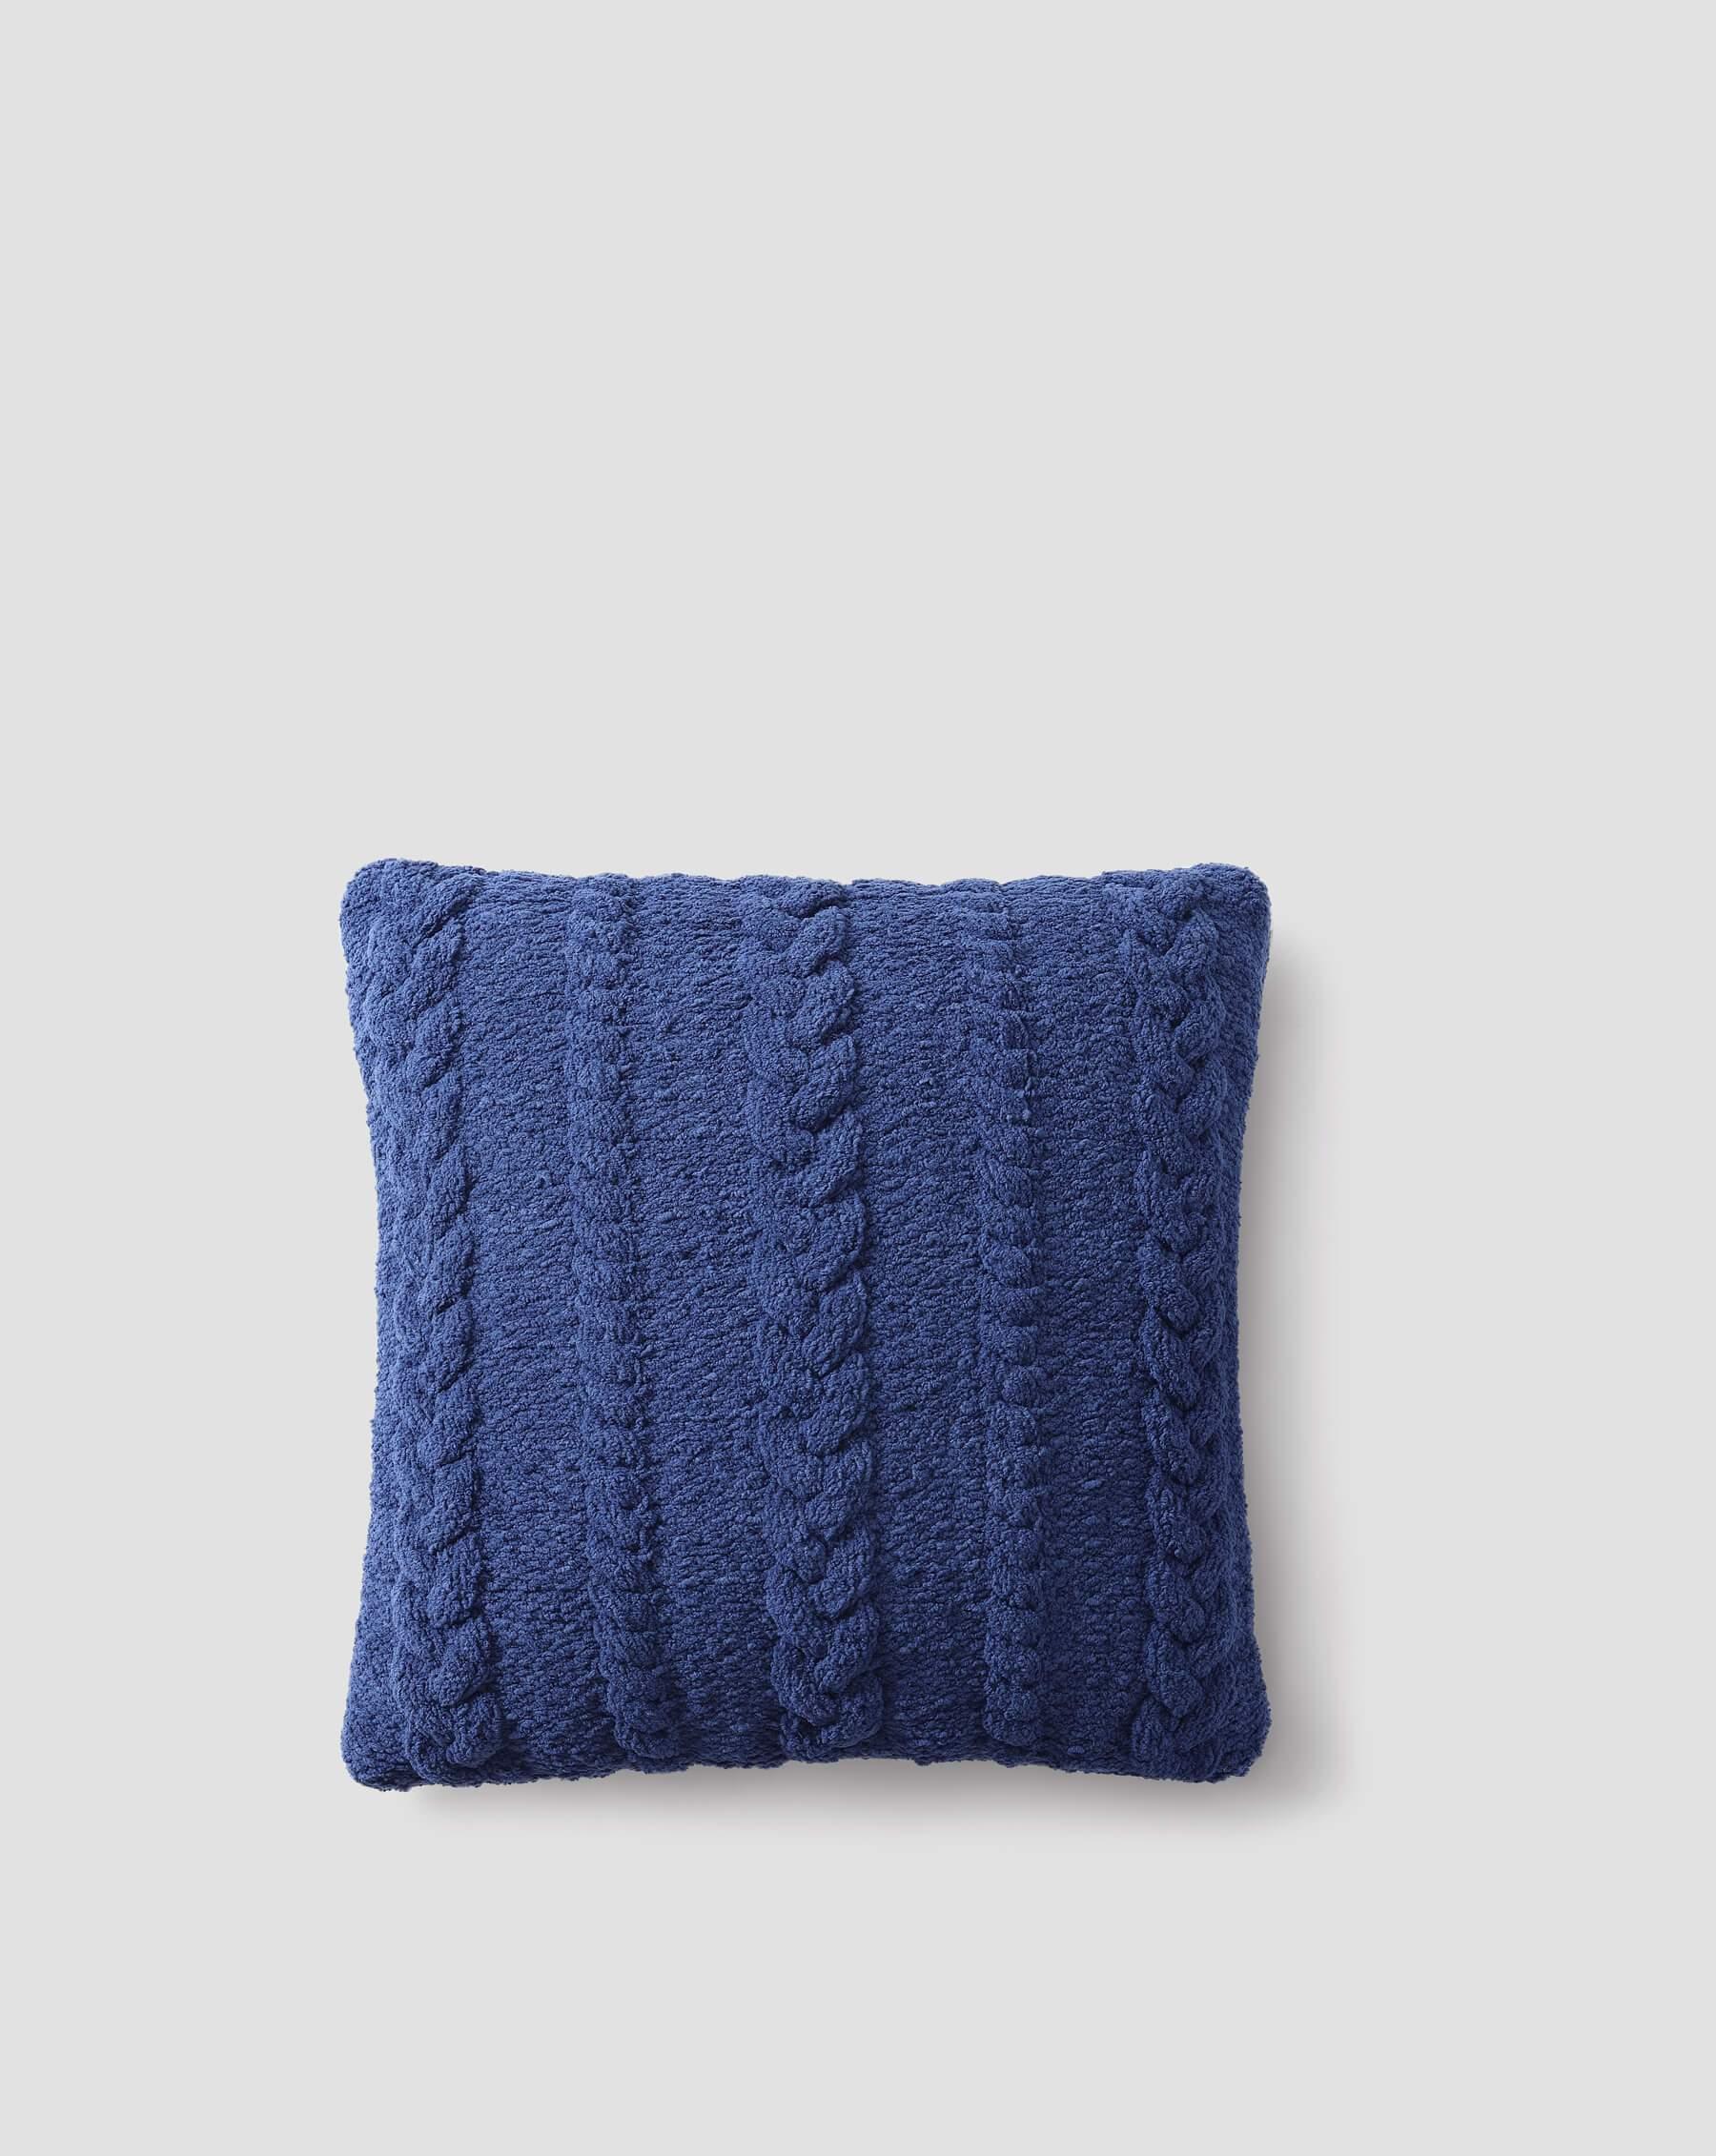 Braided Throw Pillow